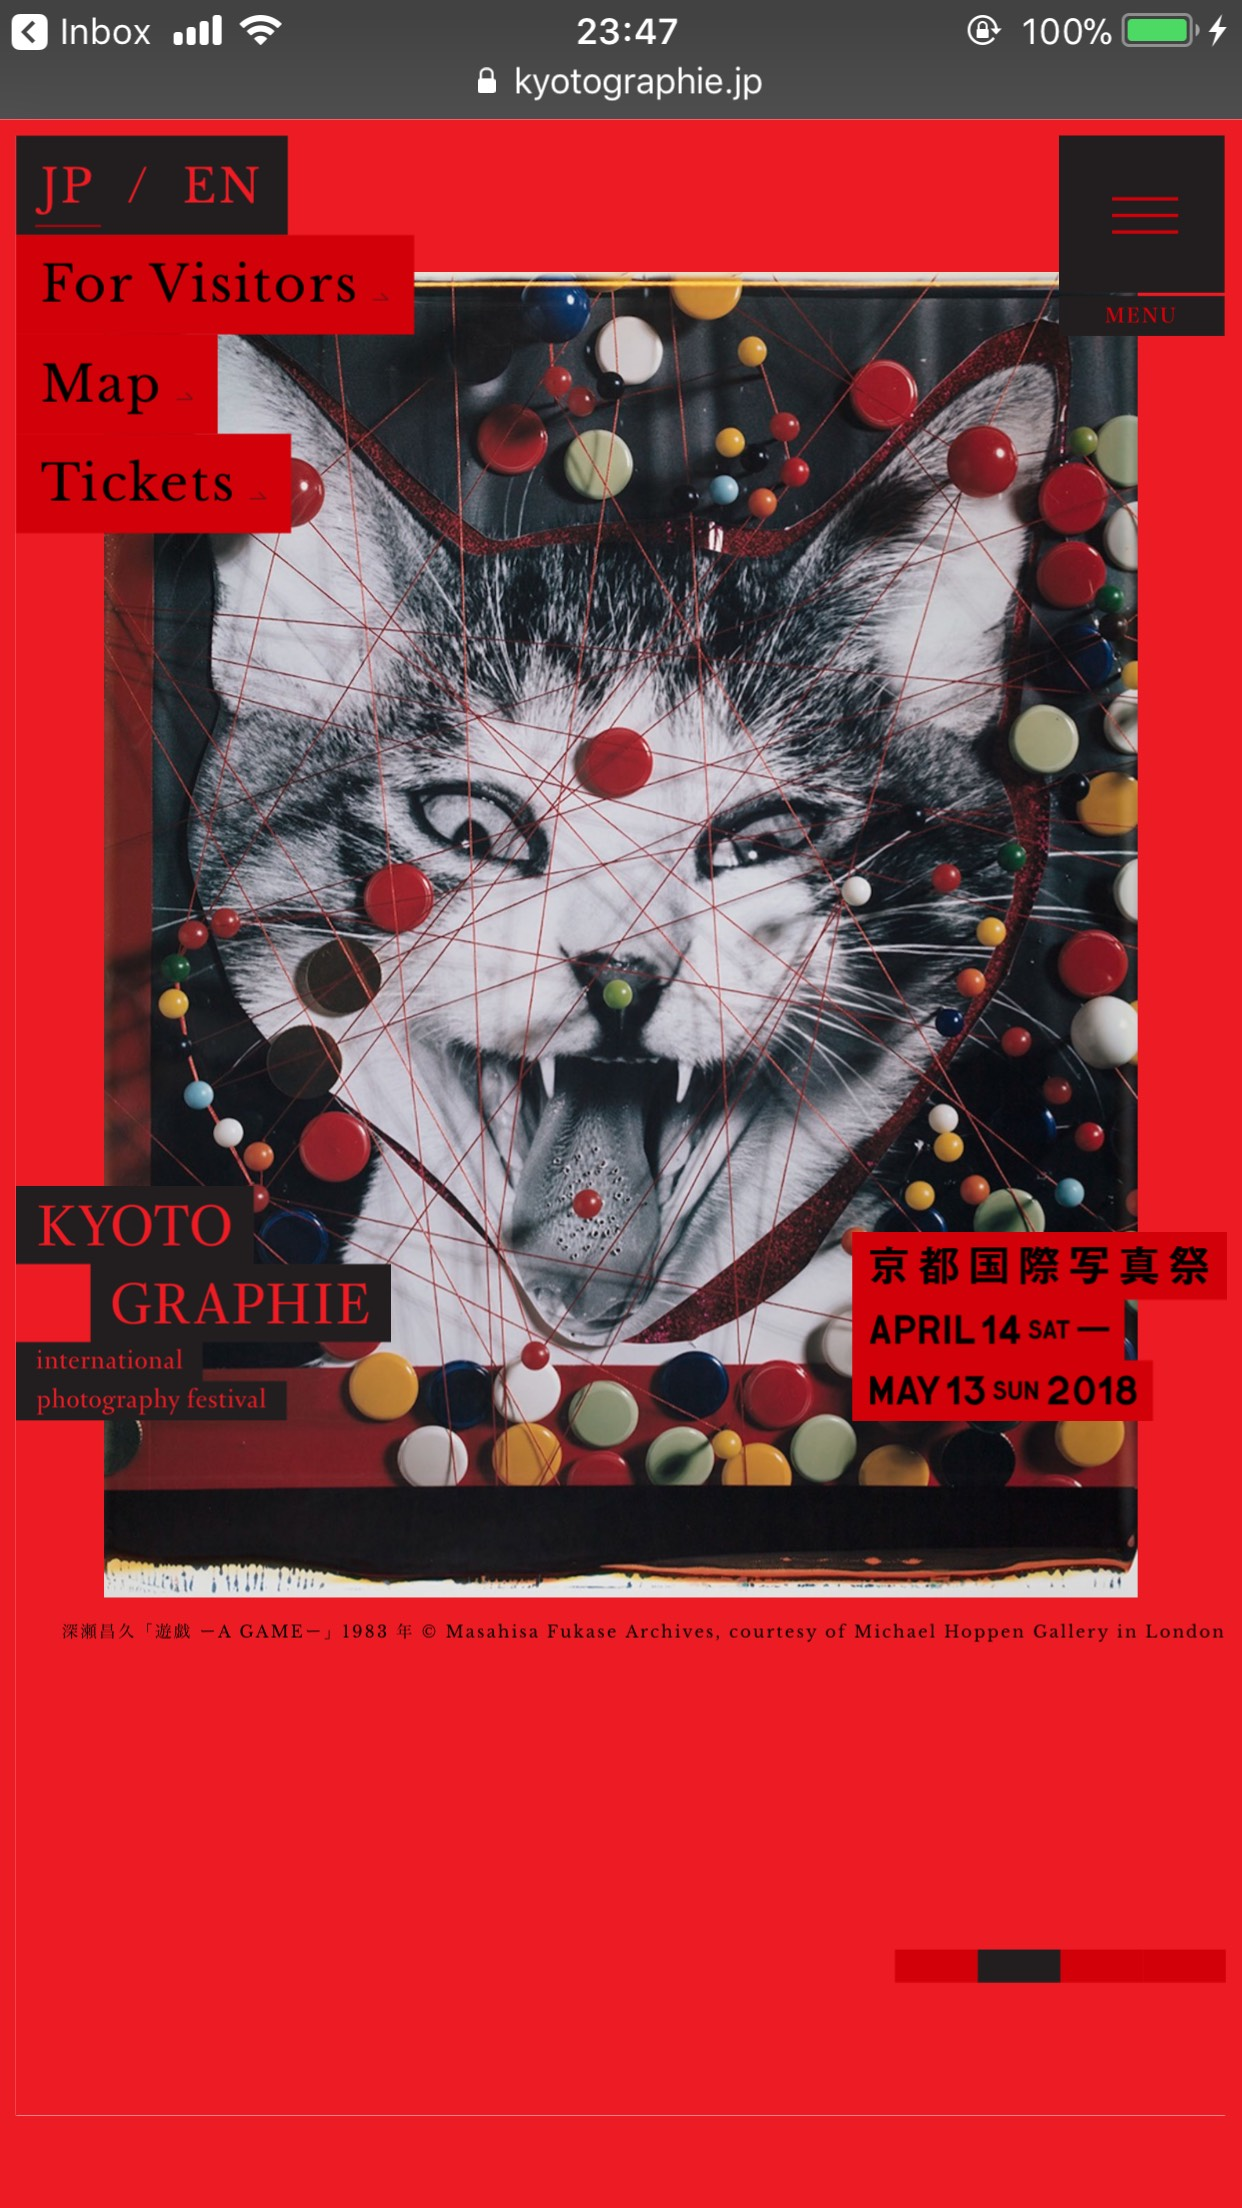 KYOTOGRAPHIE international photography festival